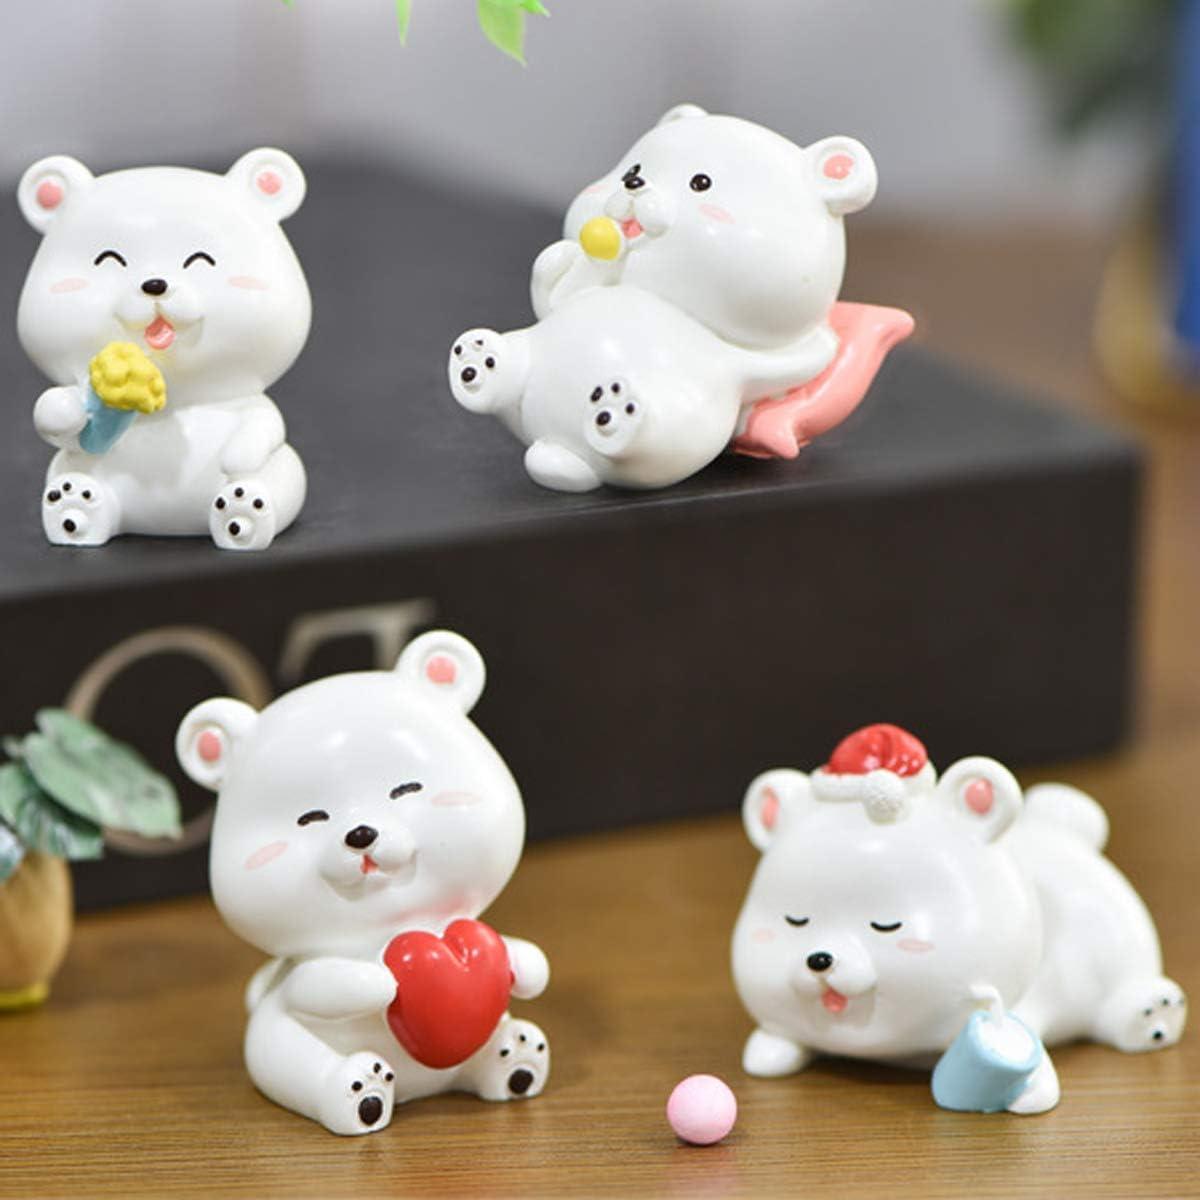 Ruzucoda Miniature Teddy Bear Figurines Animal Toys Figures Fairy Garden Cake Toppers Party Decorations Ornaments White 4 PCS